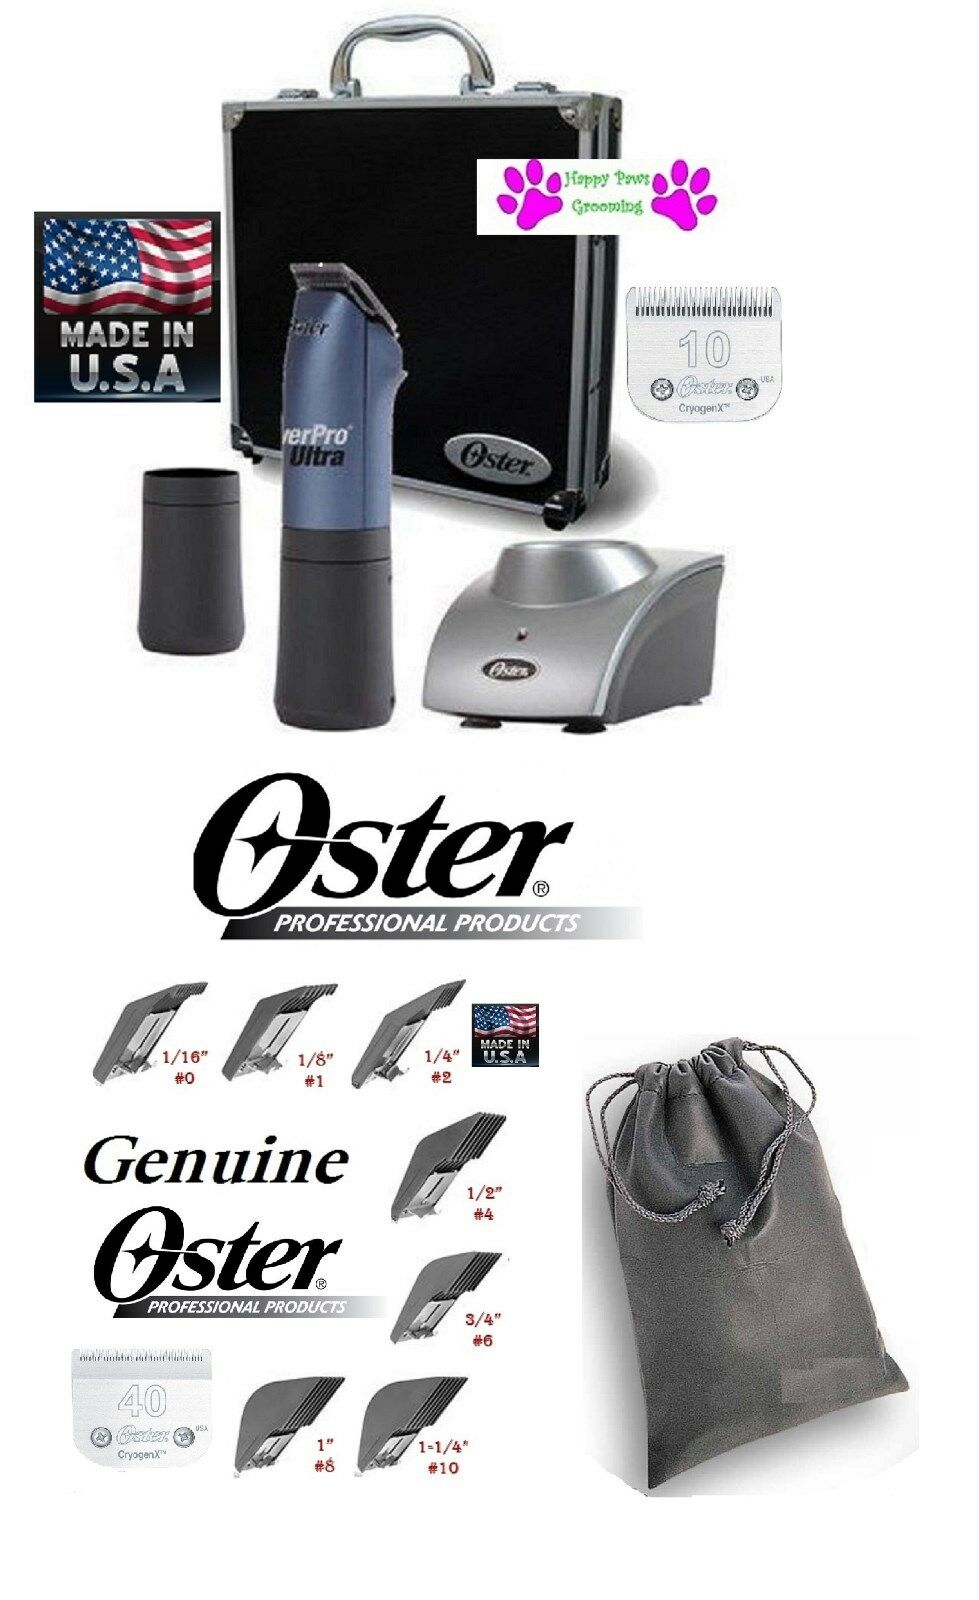 Oster Powerpro Ultra Cordless A5 Tosatrice Set #10&40 Lama, 2Battery, 7Combs,